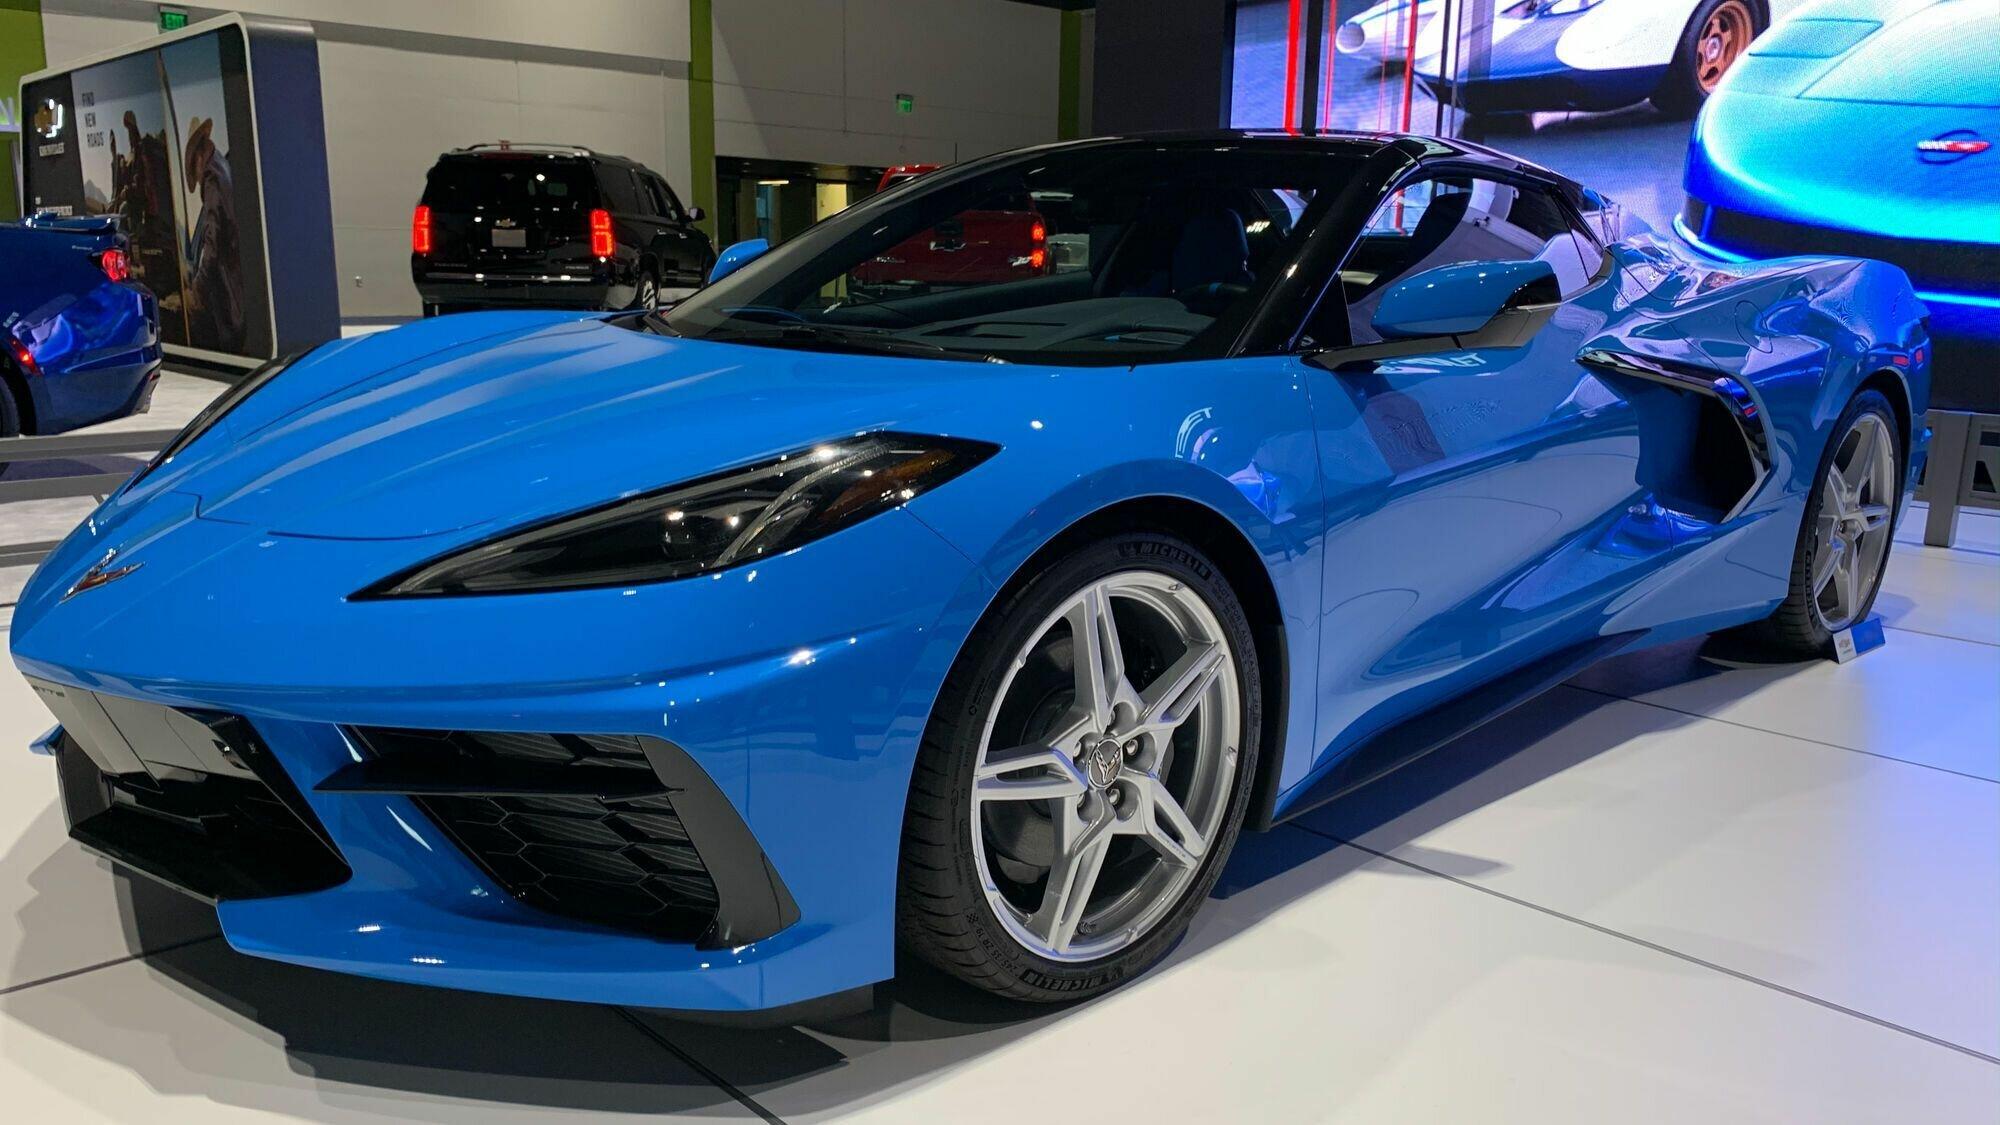 Chevy Corvette C8 разгоняется до 97 км/ч за 2,9 секунды